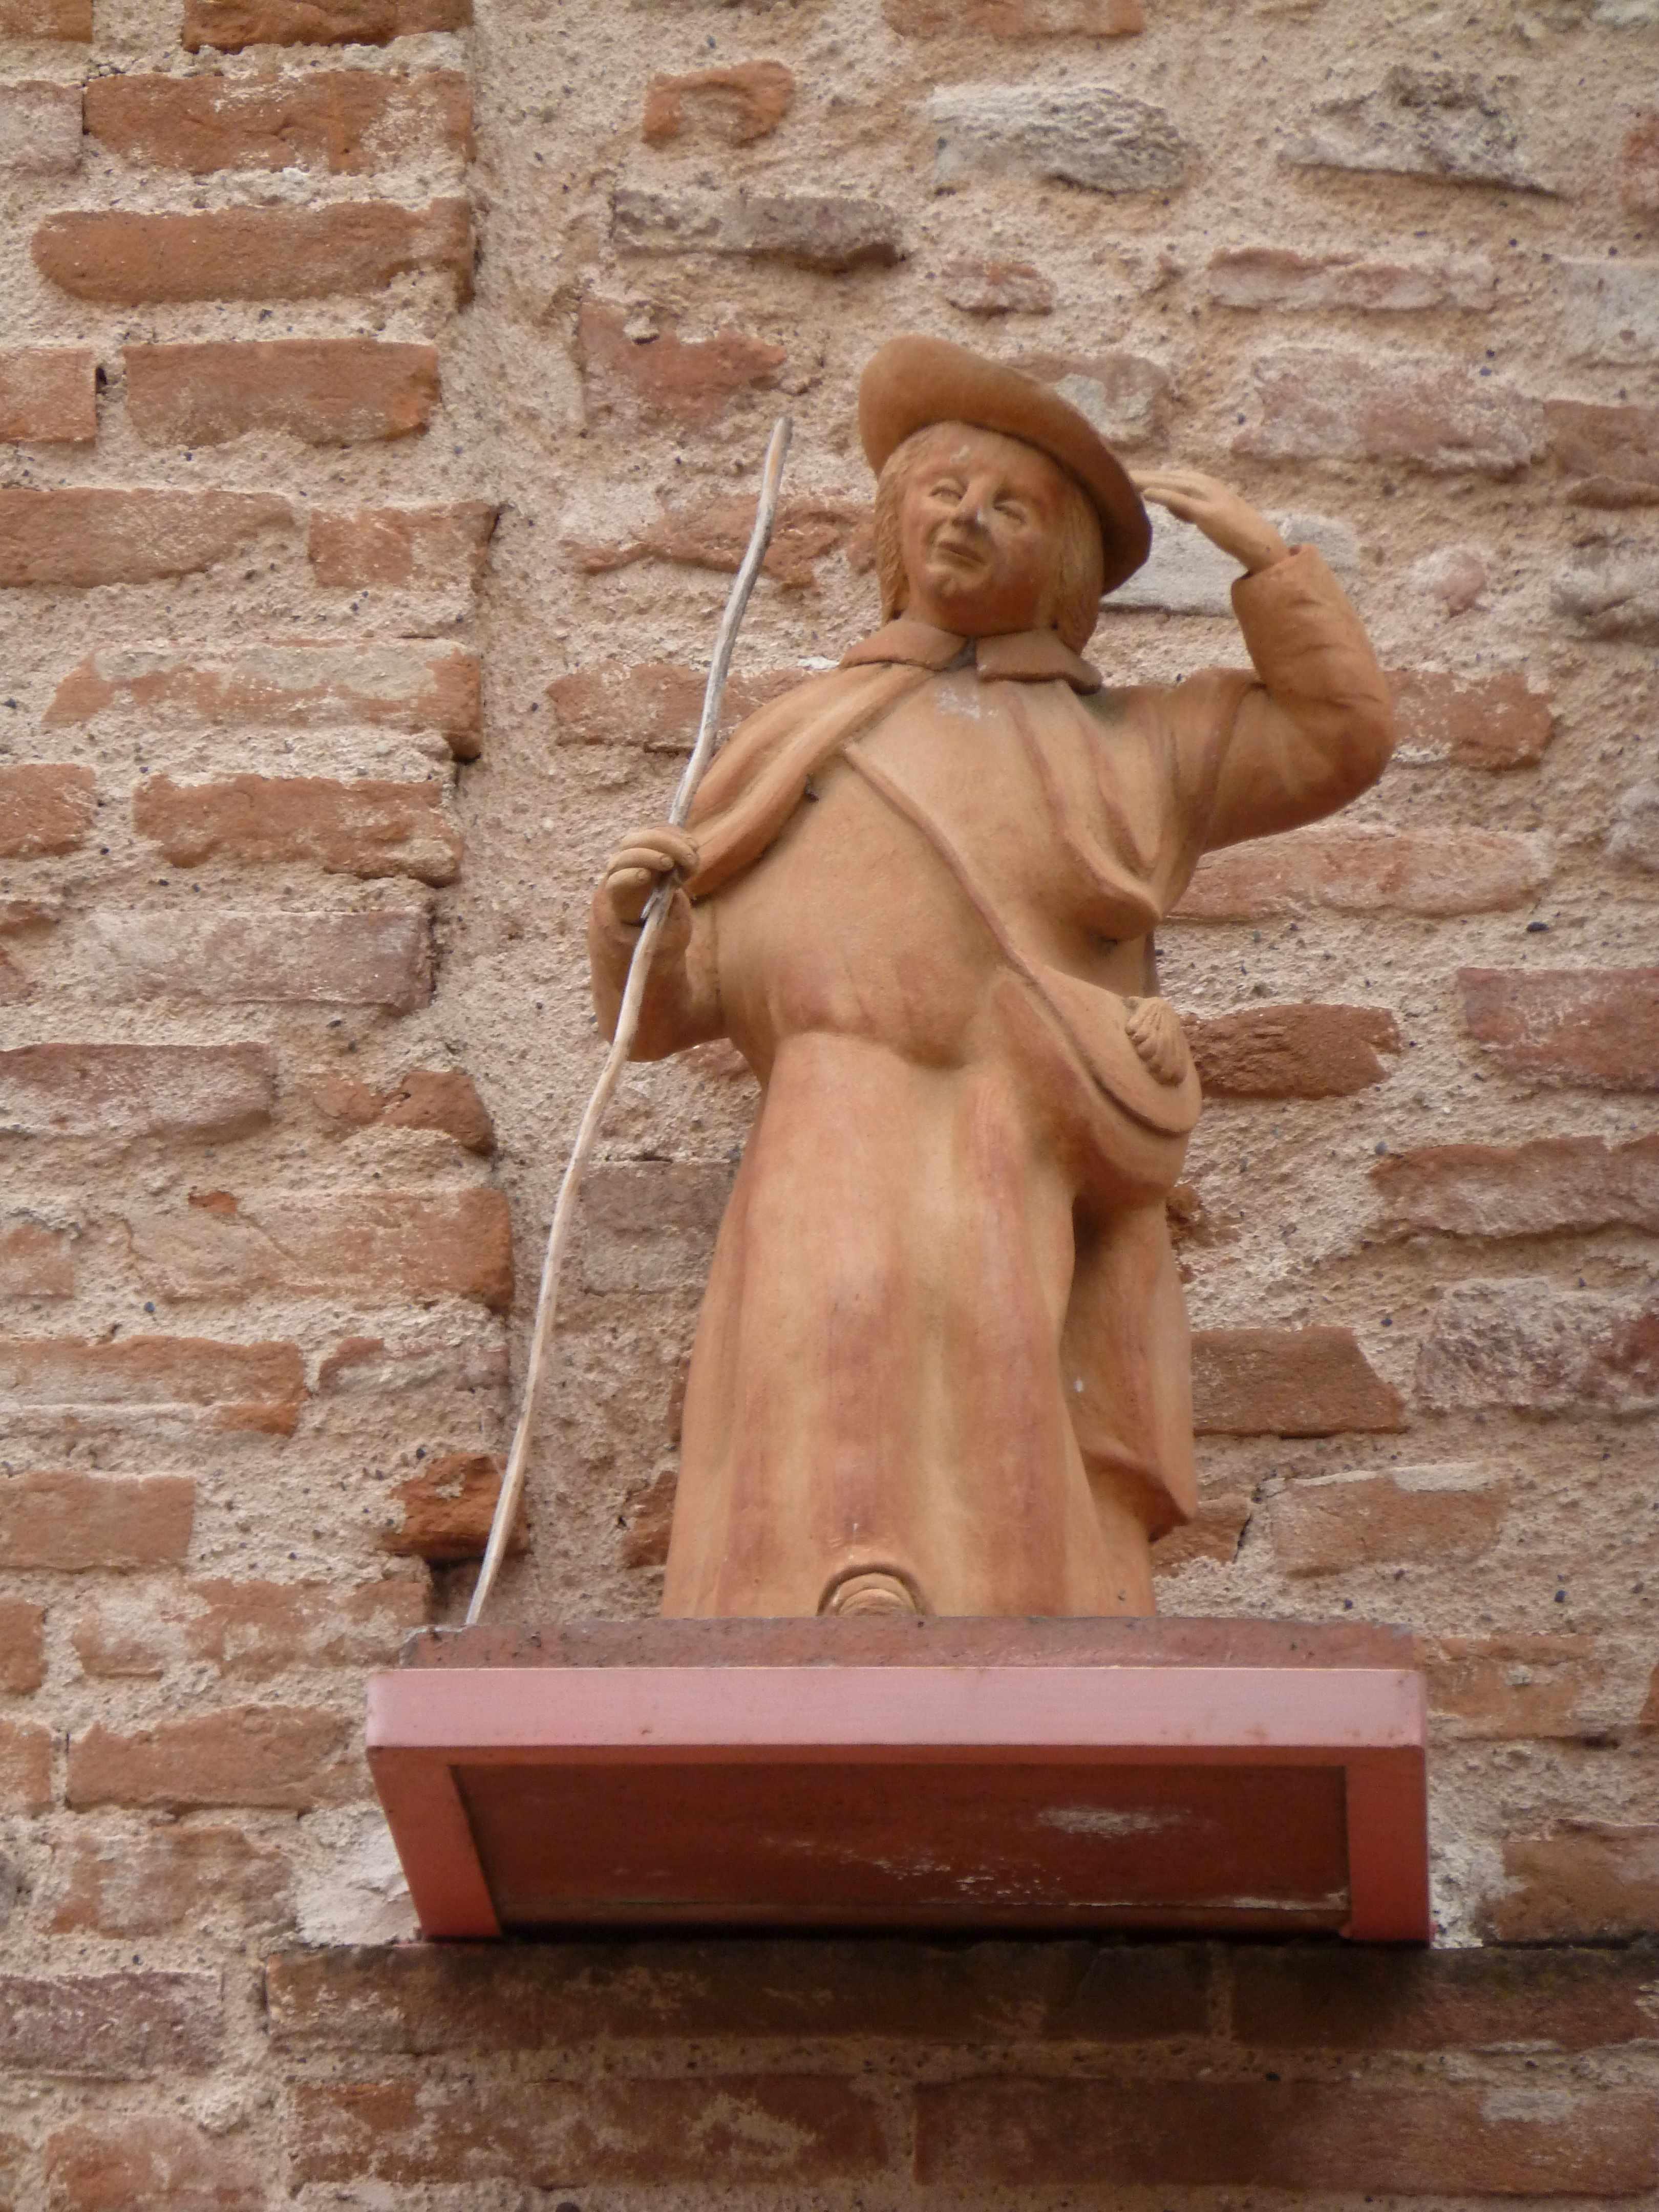 Auvillar-jacquet-statue-terre-cuite-2014-05